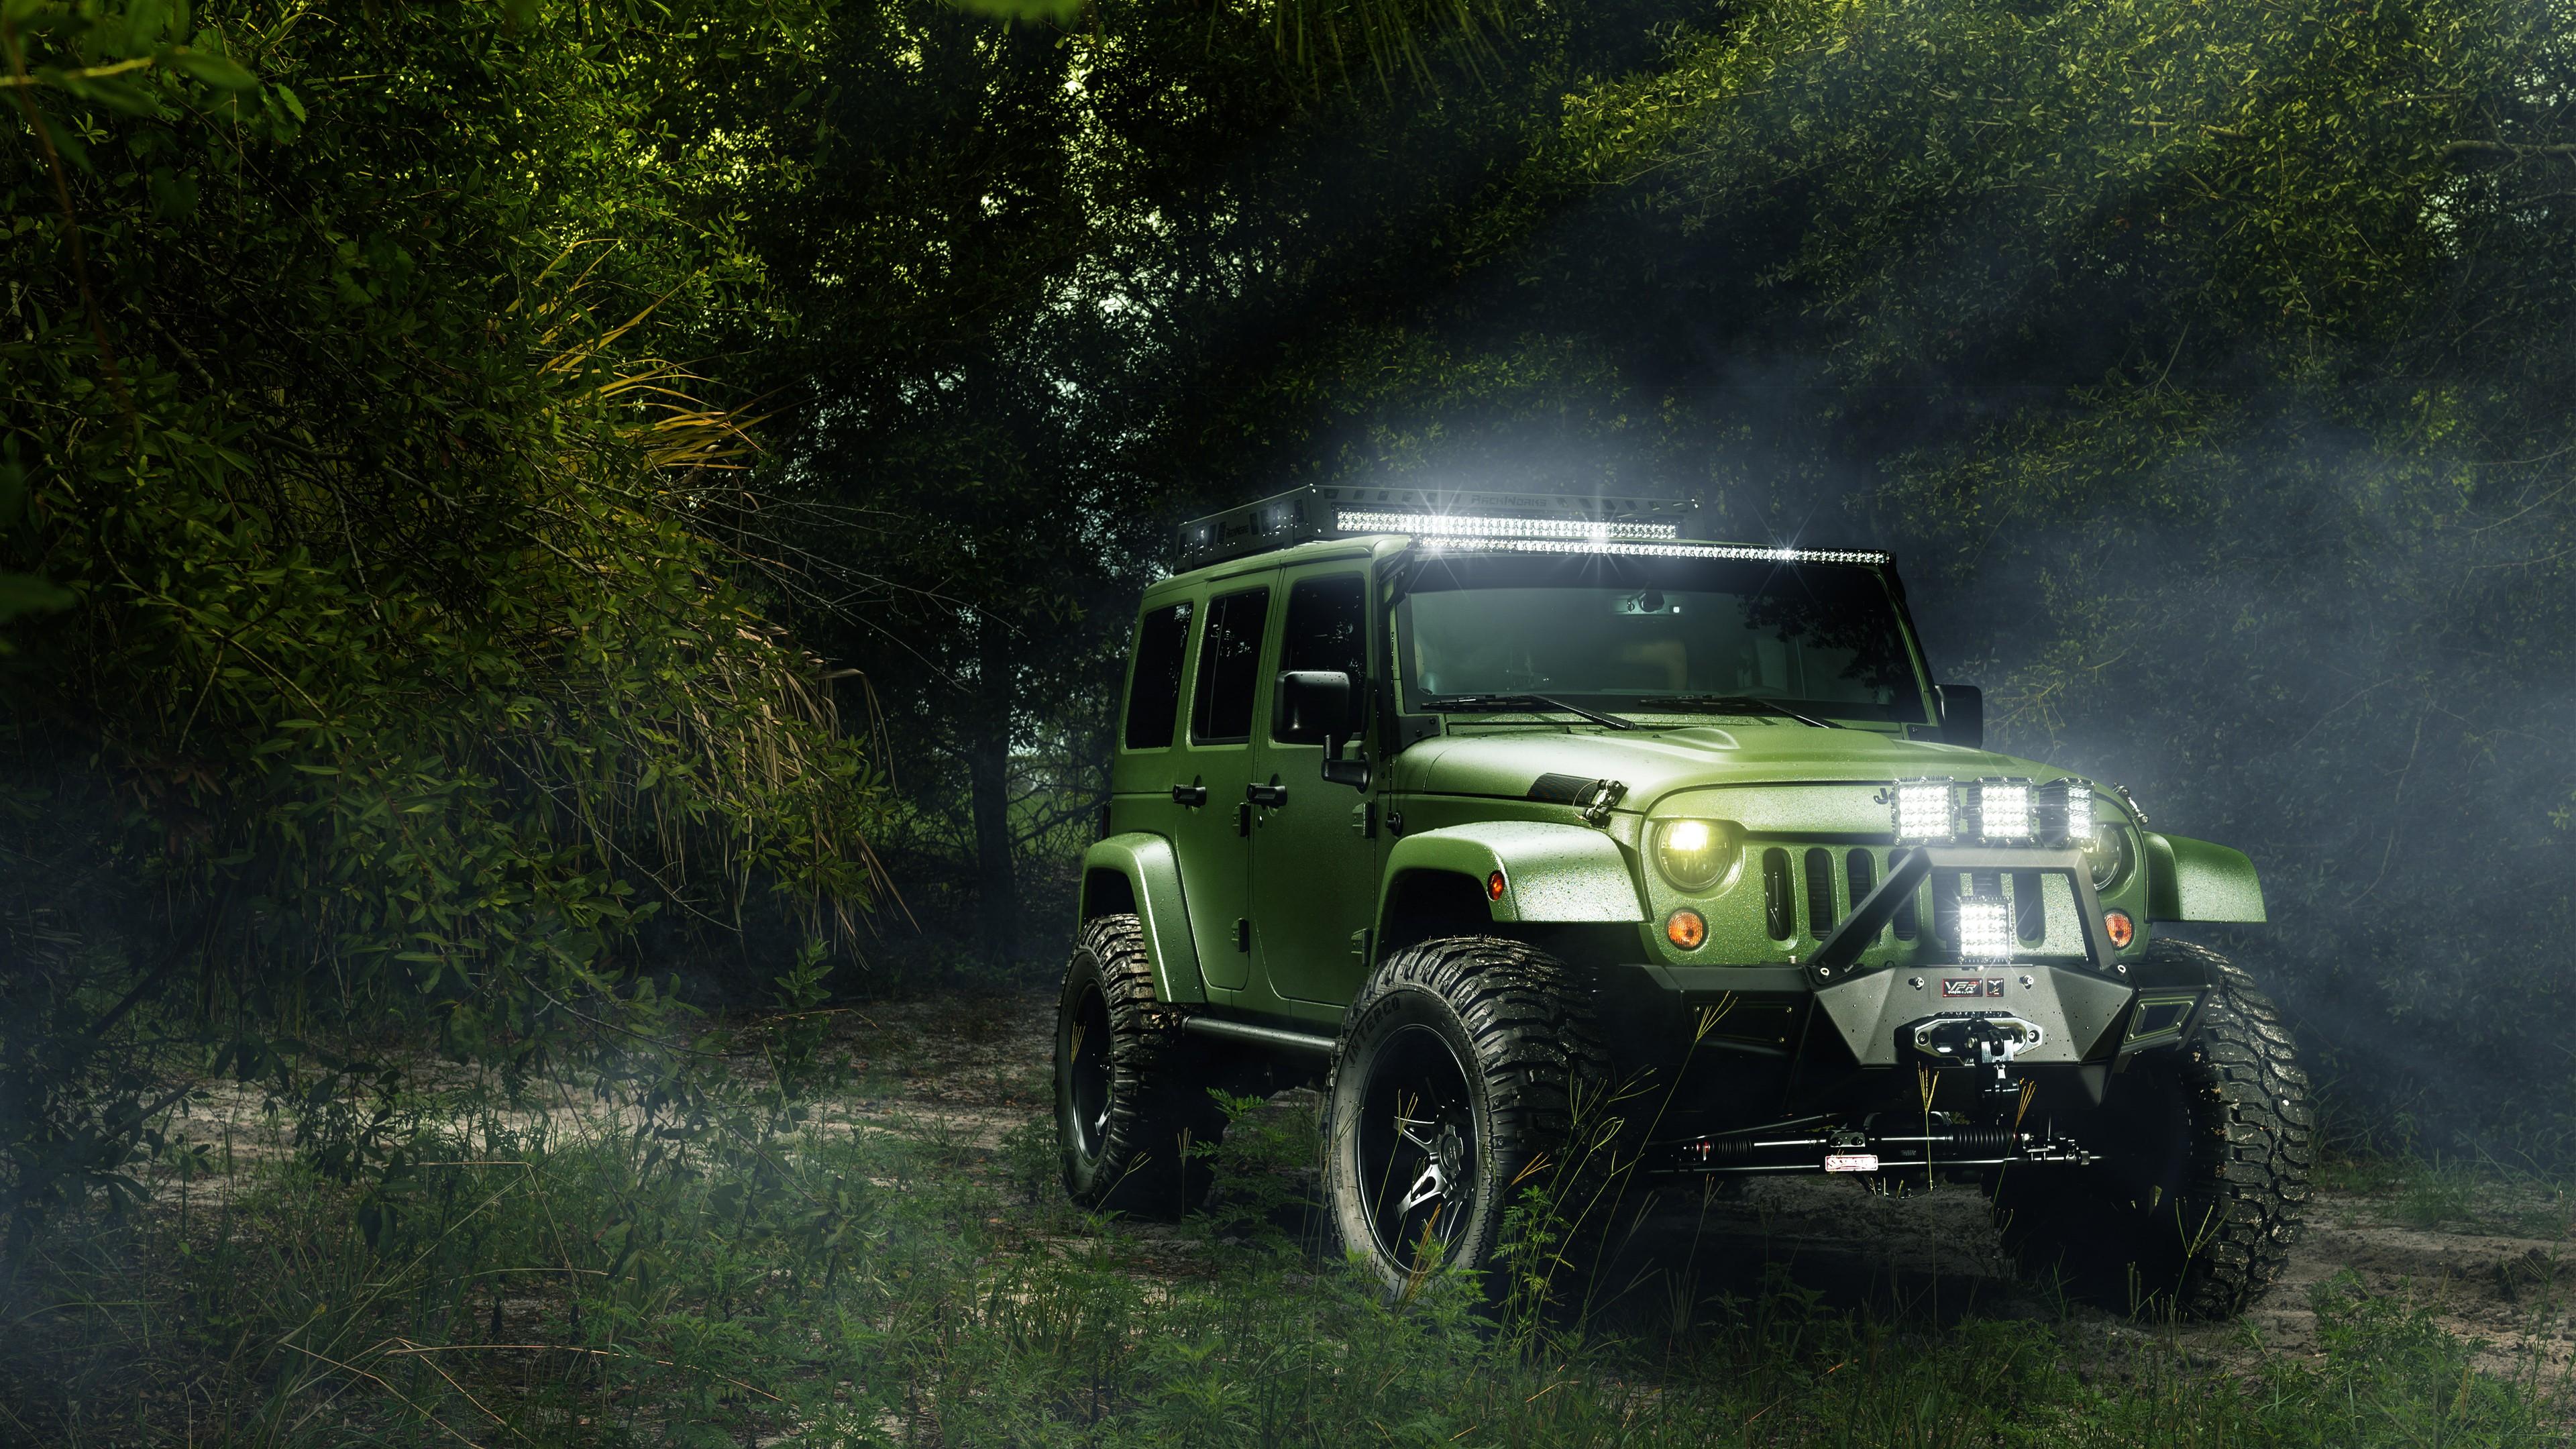 Jeep Wrangler Wallpaper Hd Car Wallpapers Id 5570